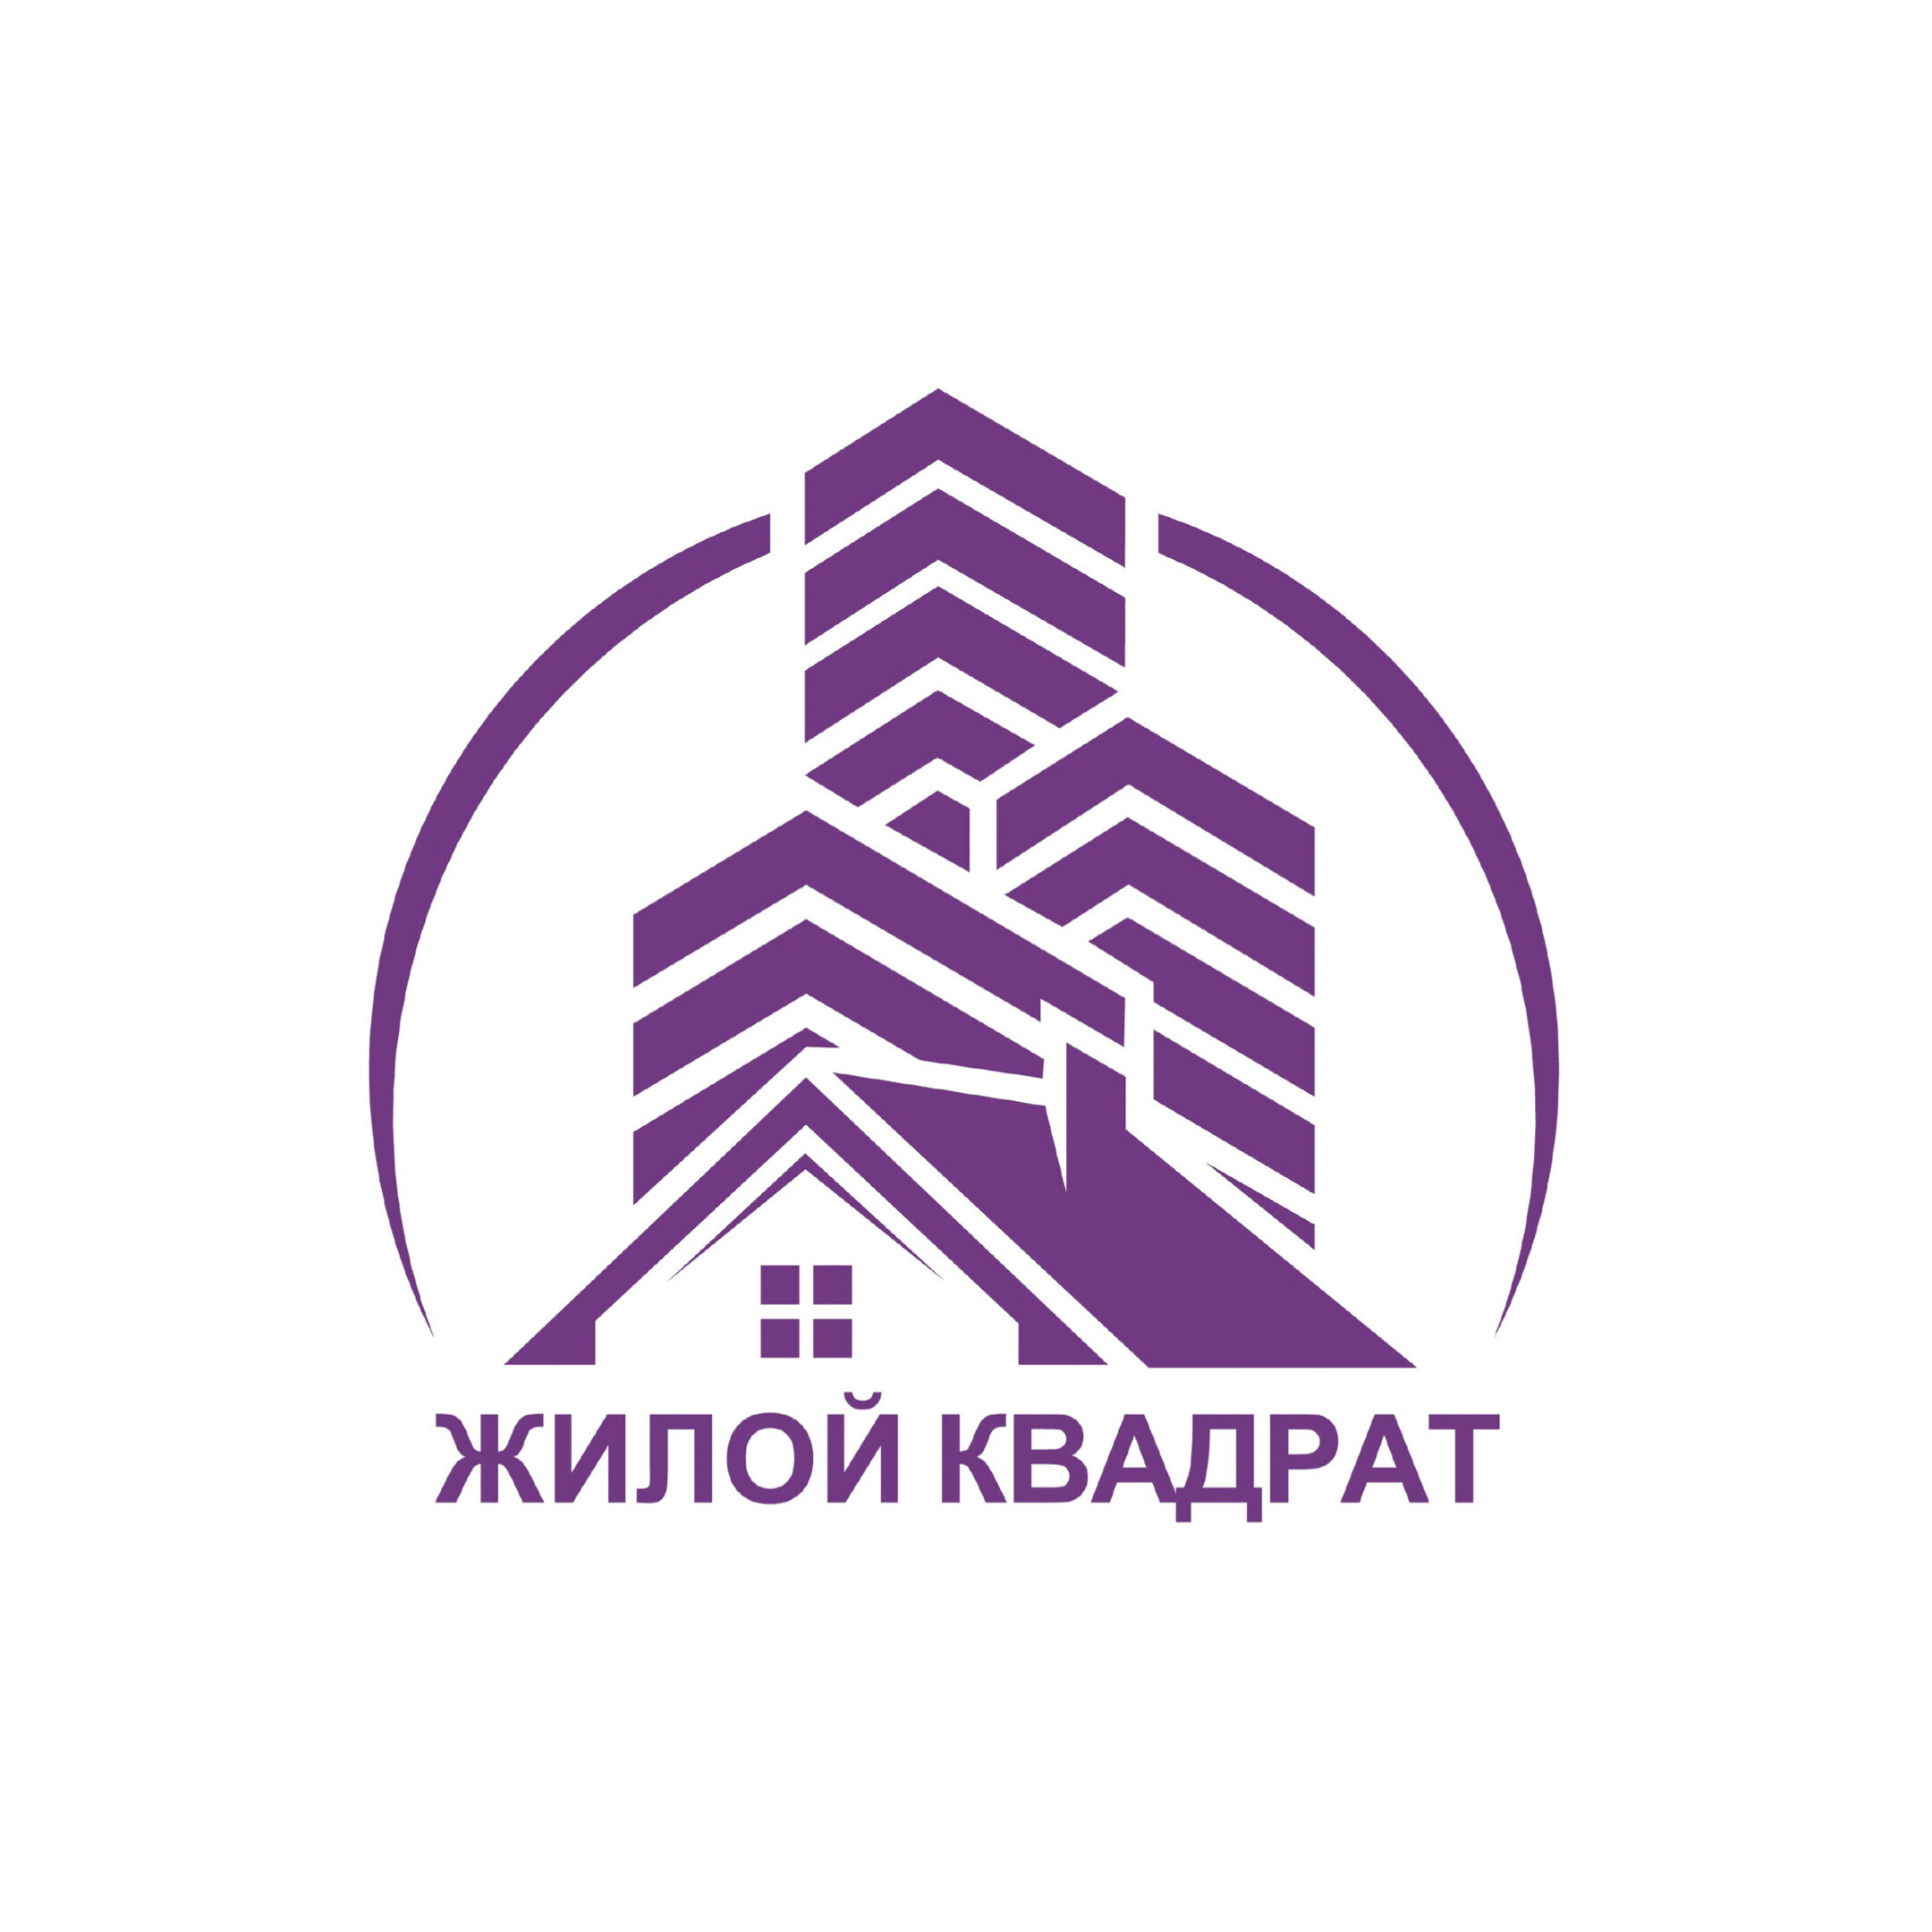 Жилой Квадрат - business profile of the company on lalafo.kg in Кыргызстан